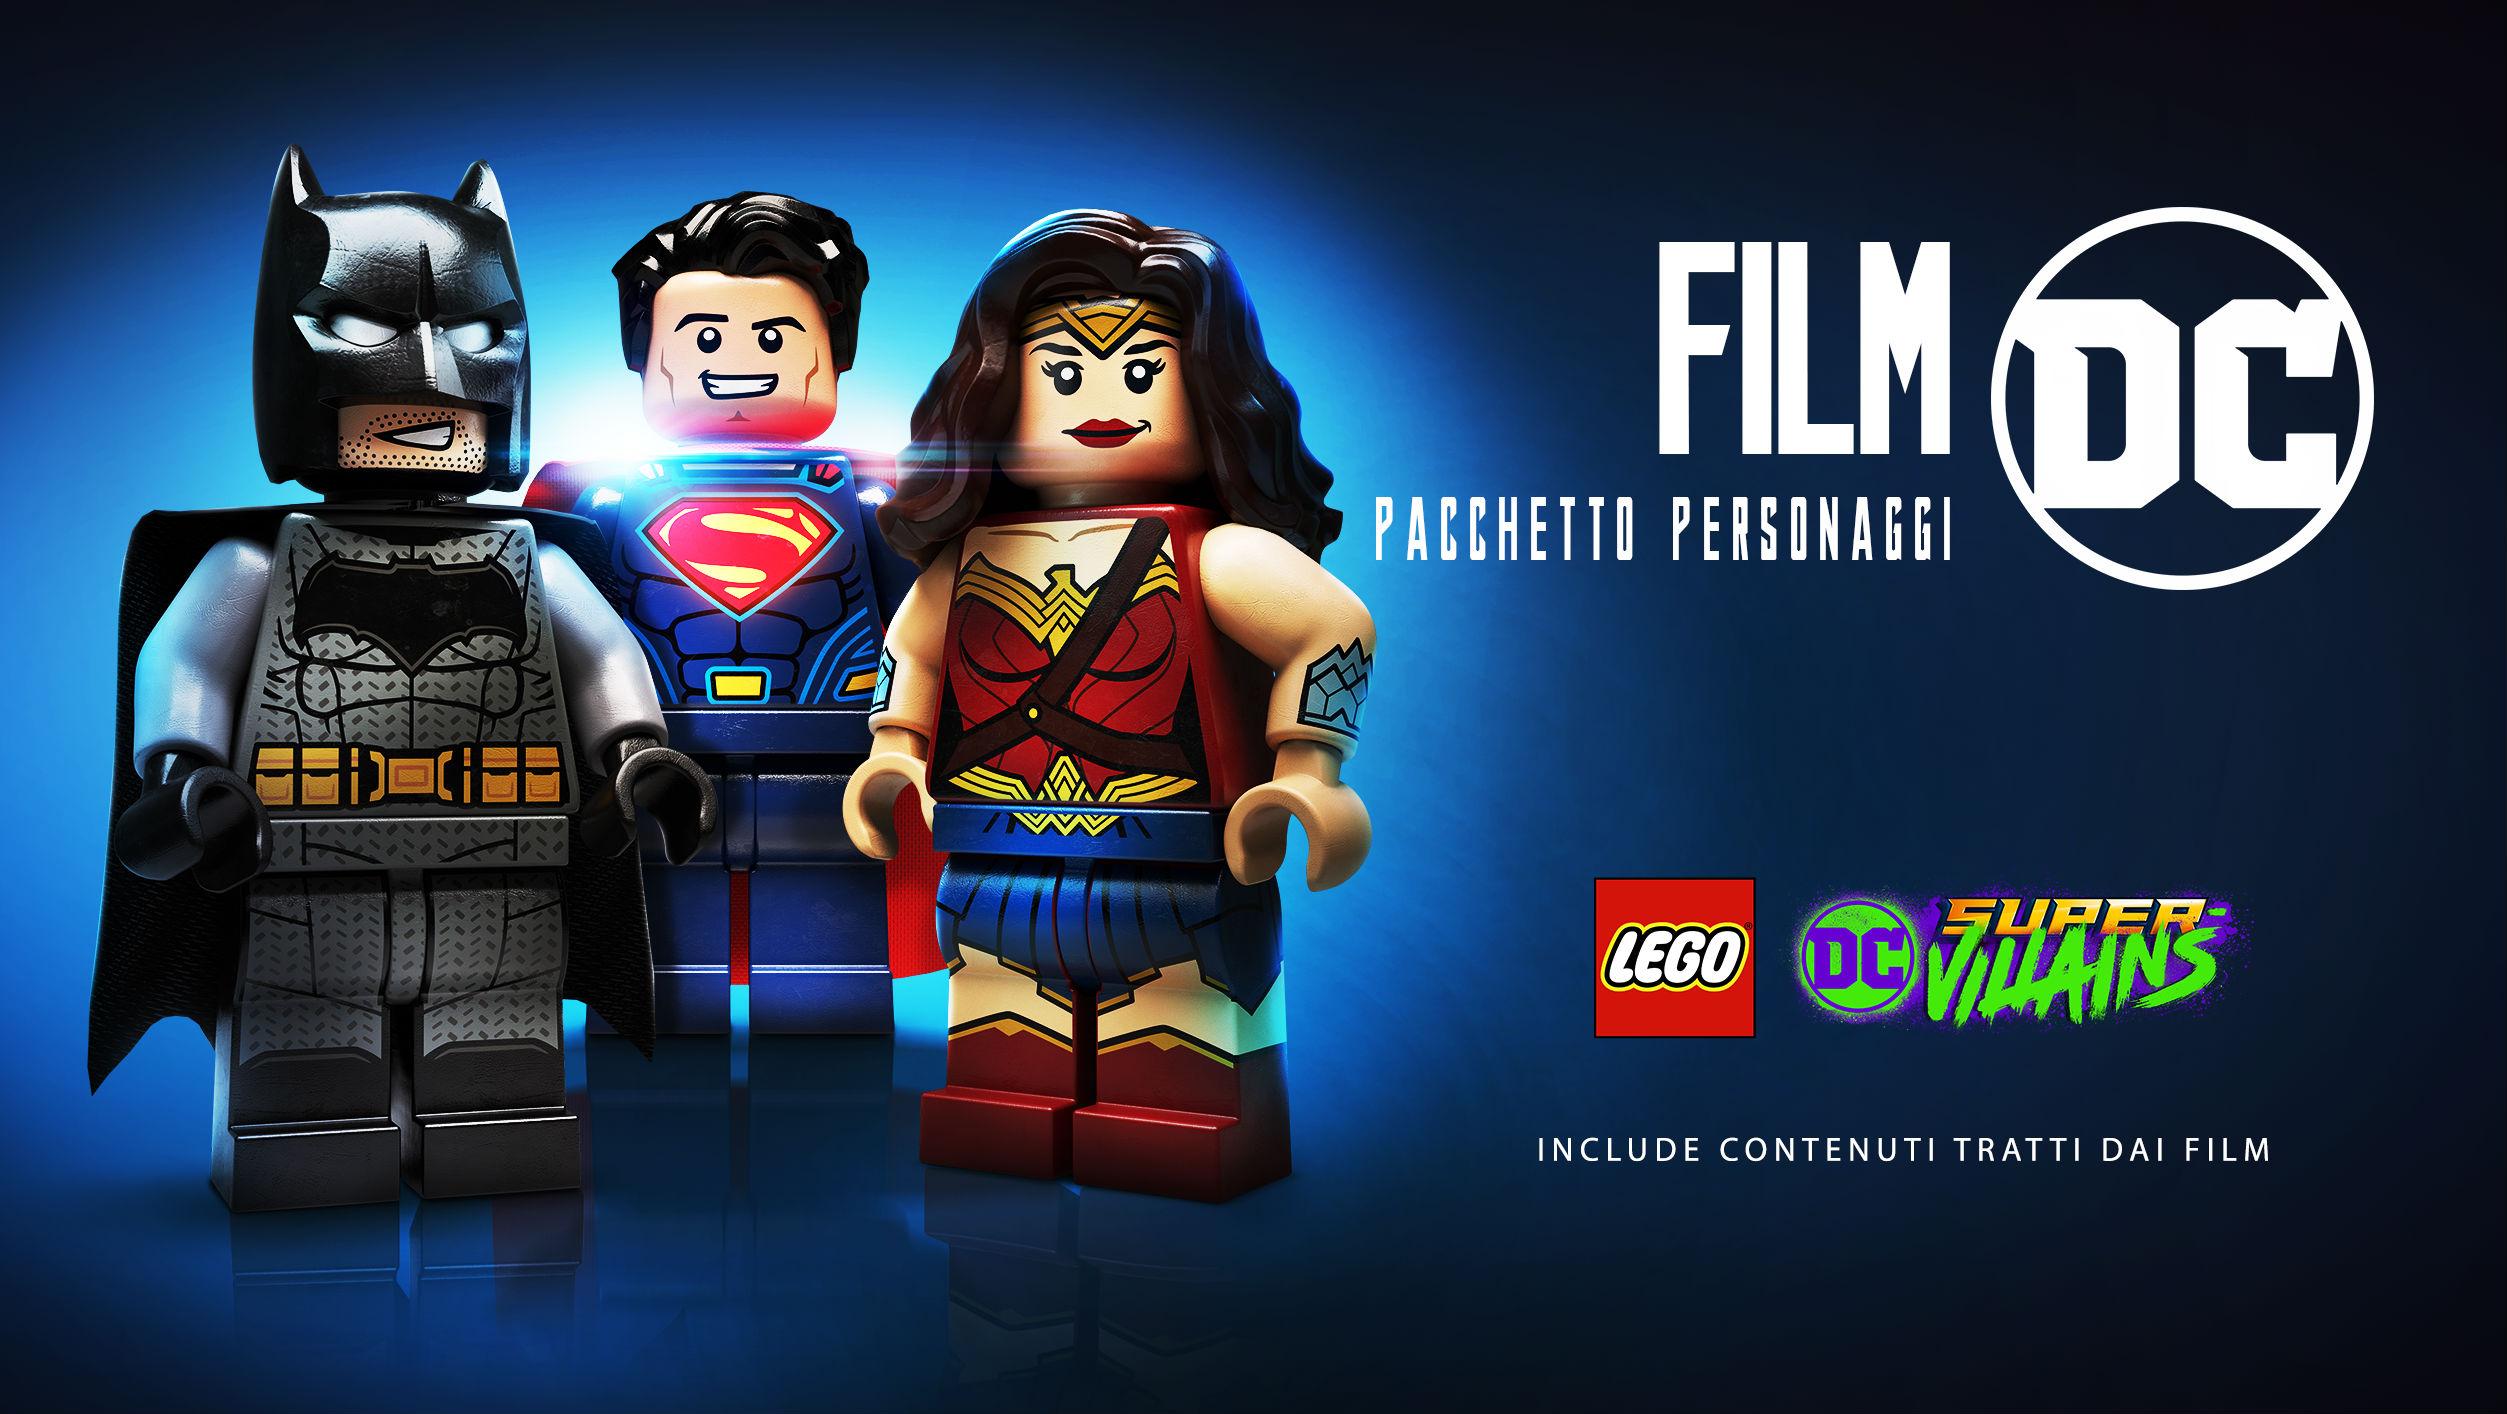 Lego Dc Super Villains - Artwork